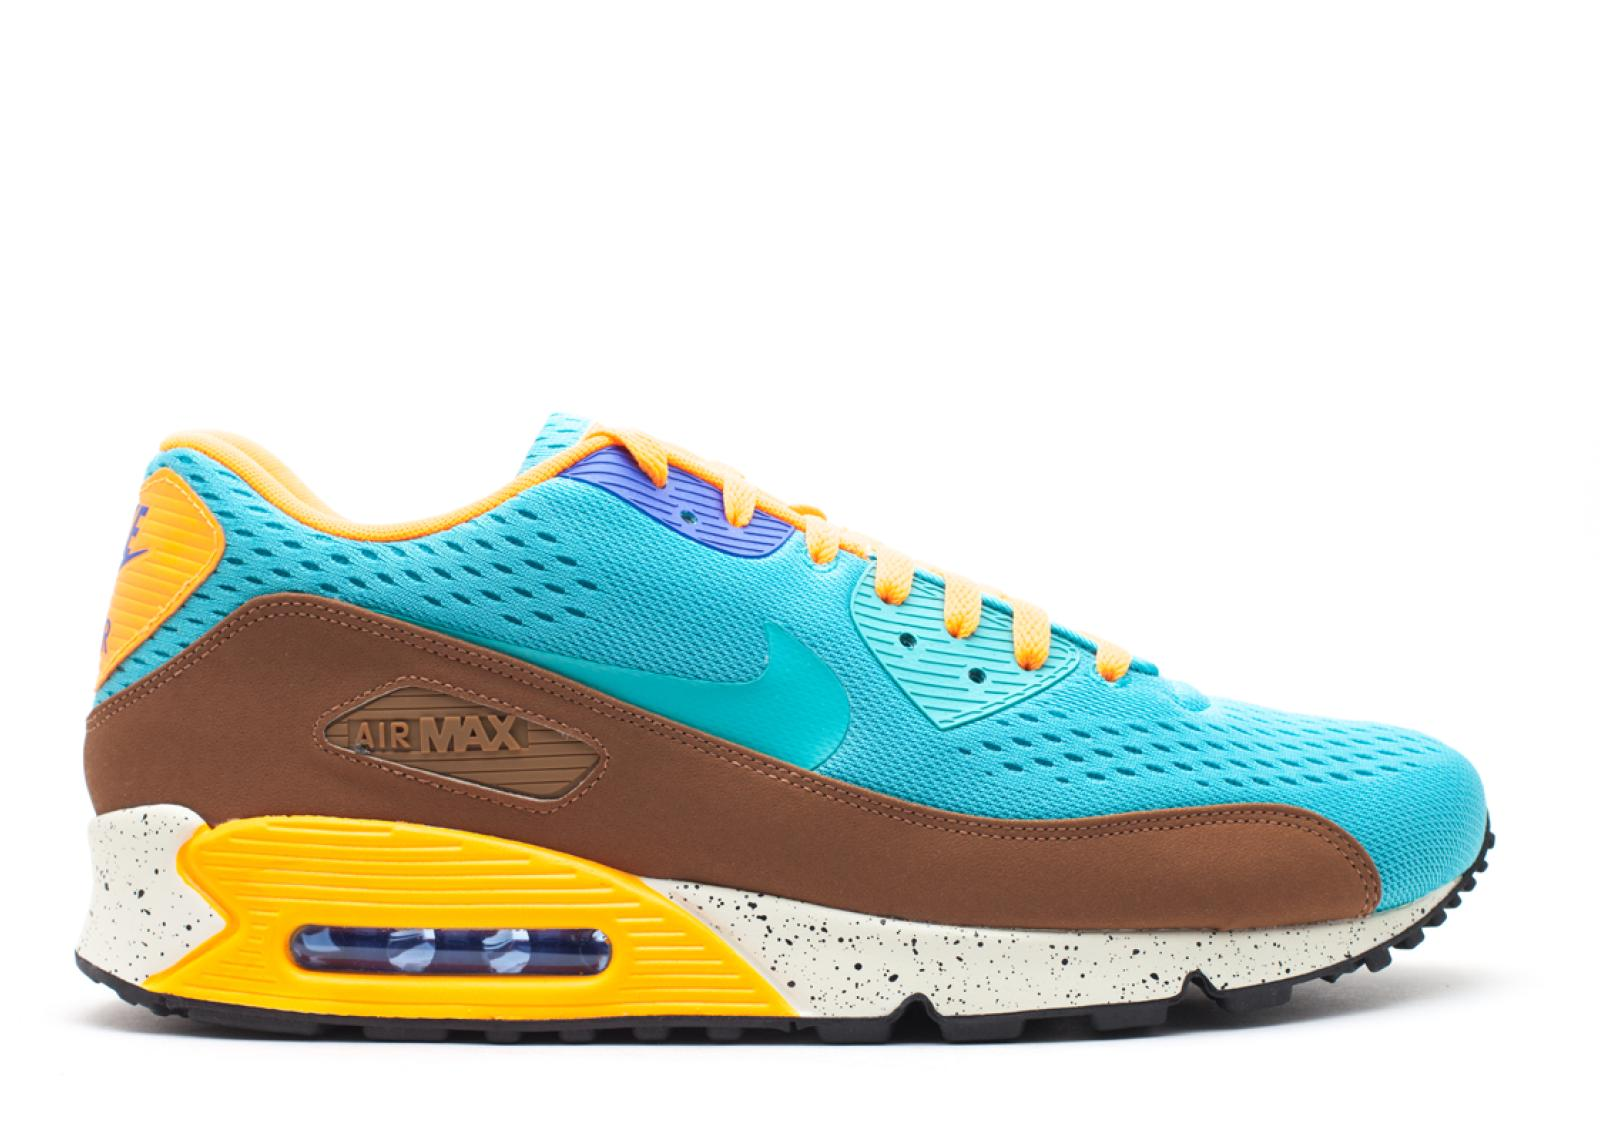 Nike Air Max 98 OG Tour Yellow – Hanon